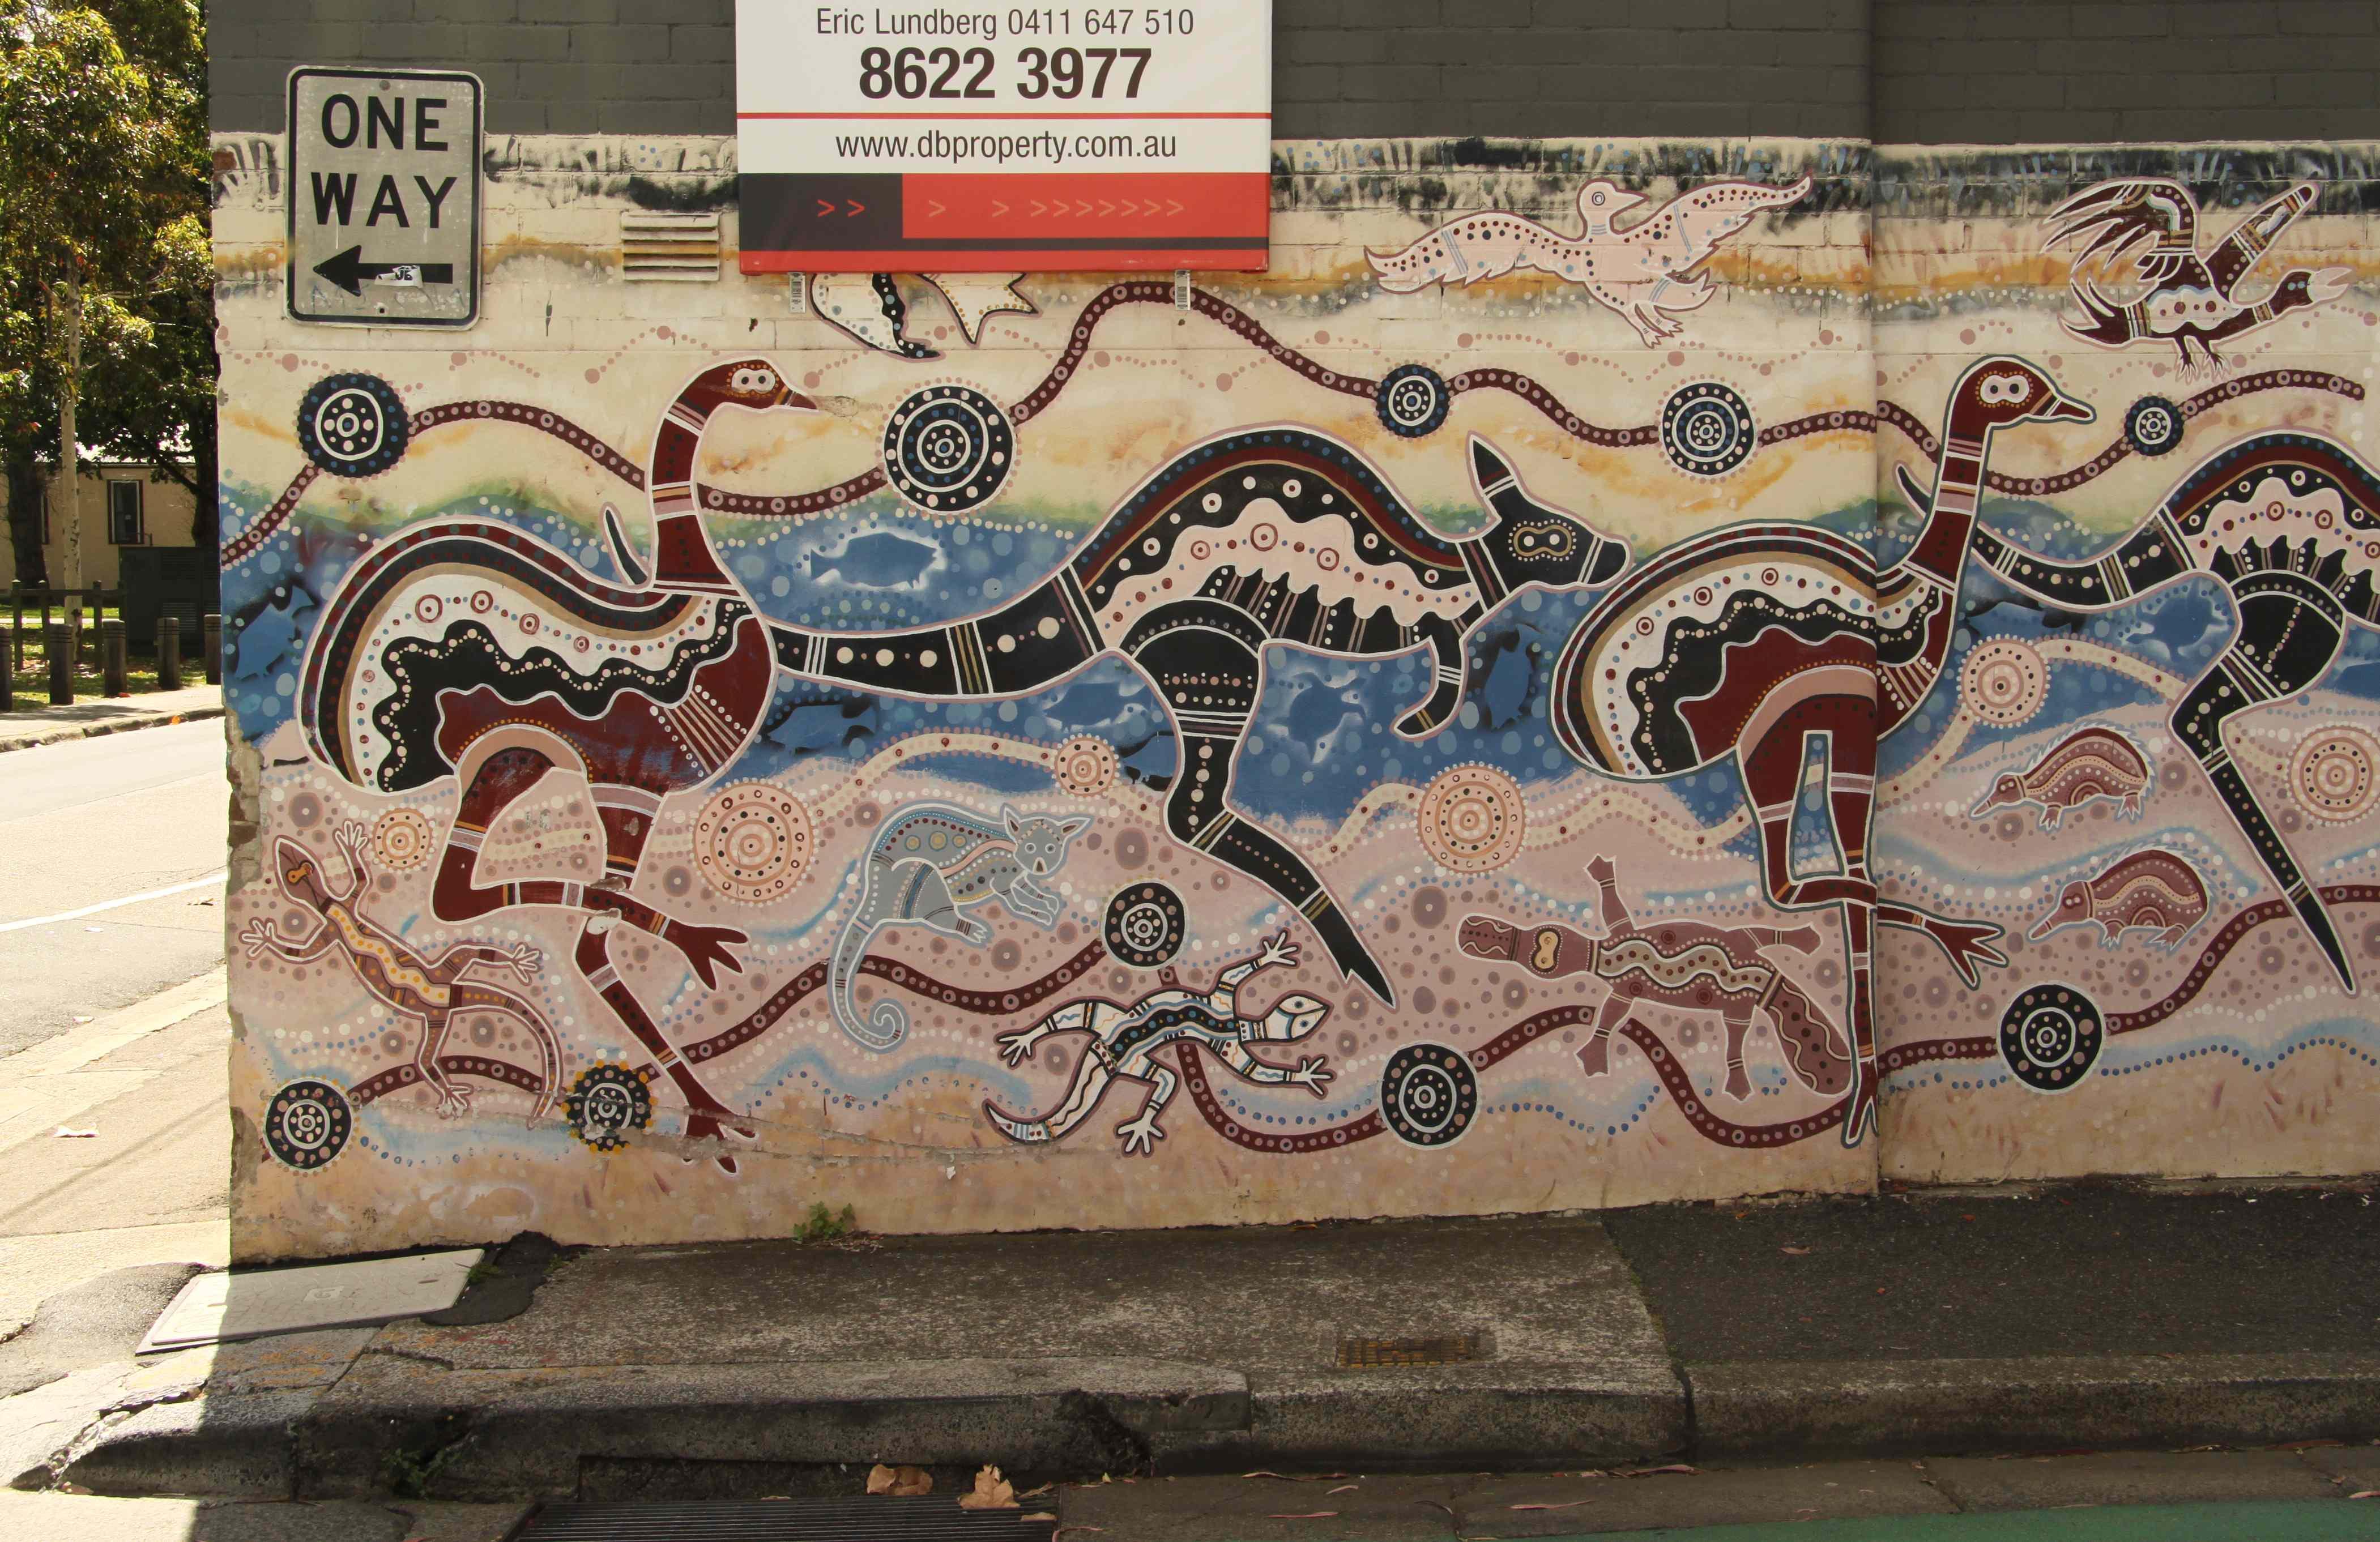 aboriginal wall art shenra com street art newtown sydney richard tulloch s life on the road